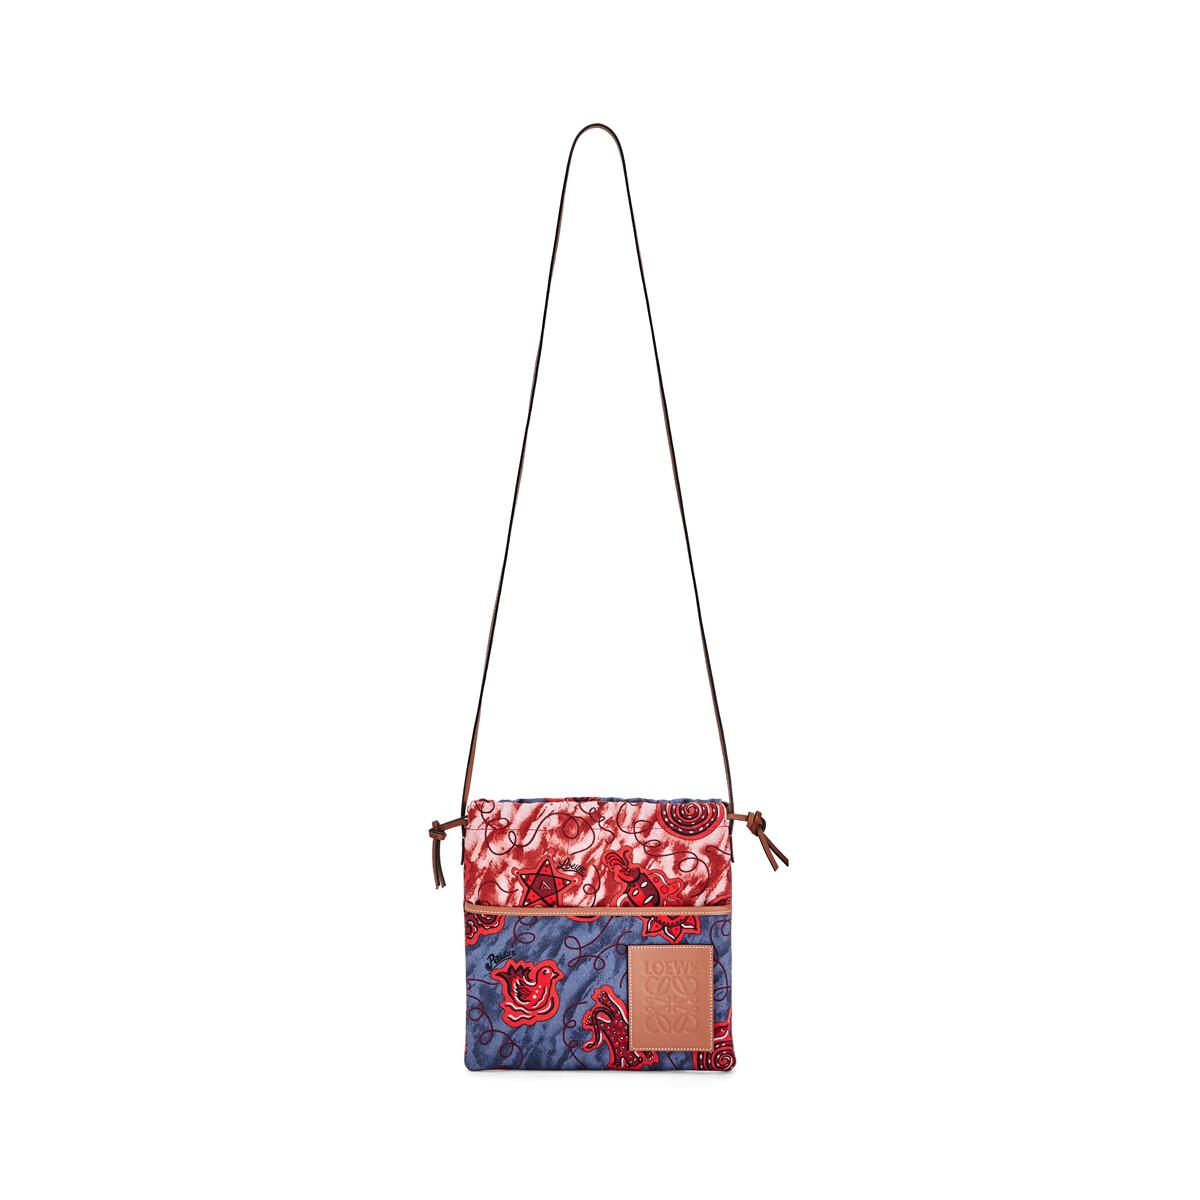 LOEWE Paula's Small Drawstring Pouch 蓝色/红色 front